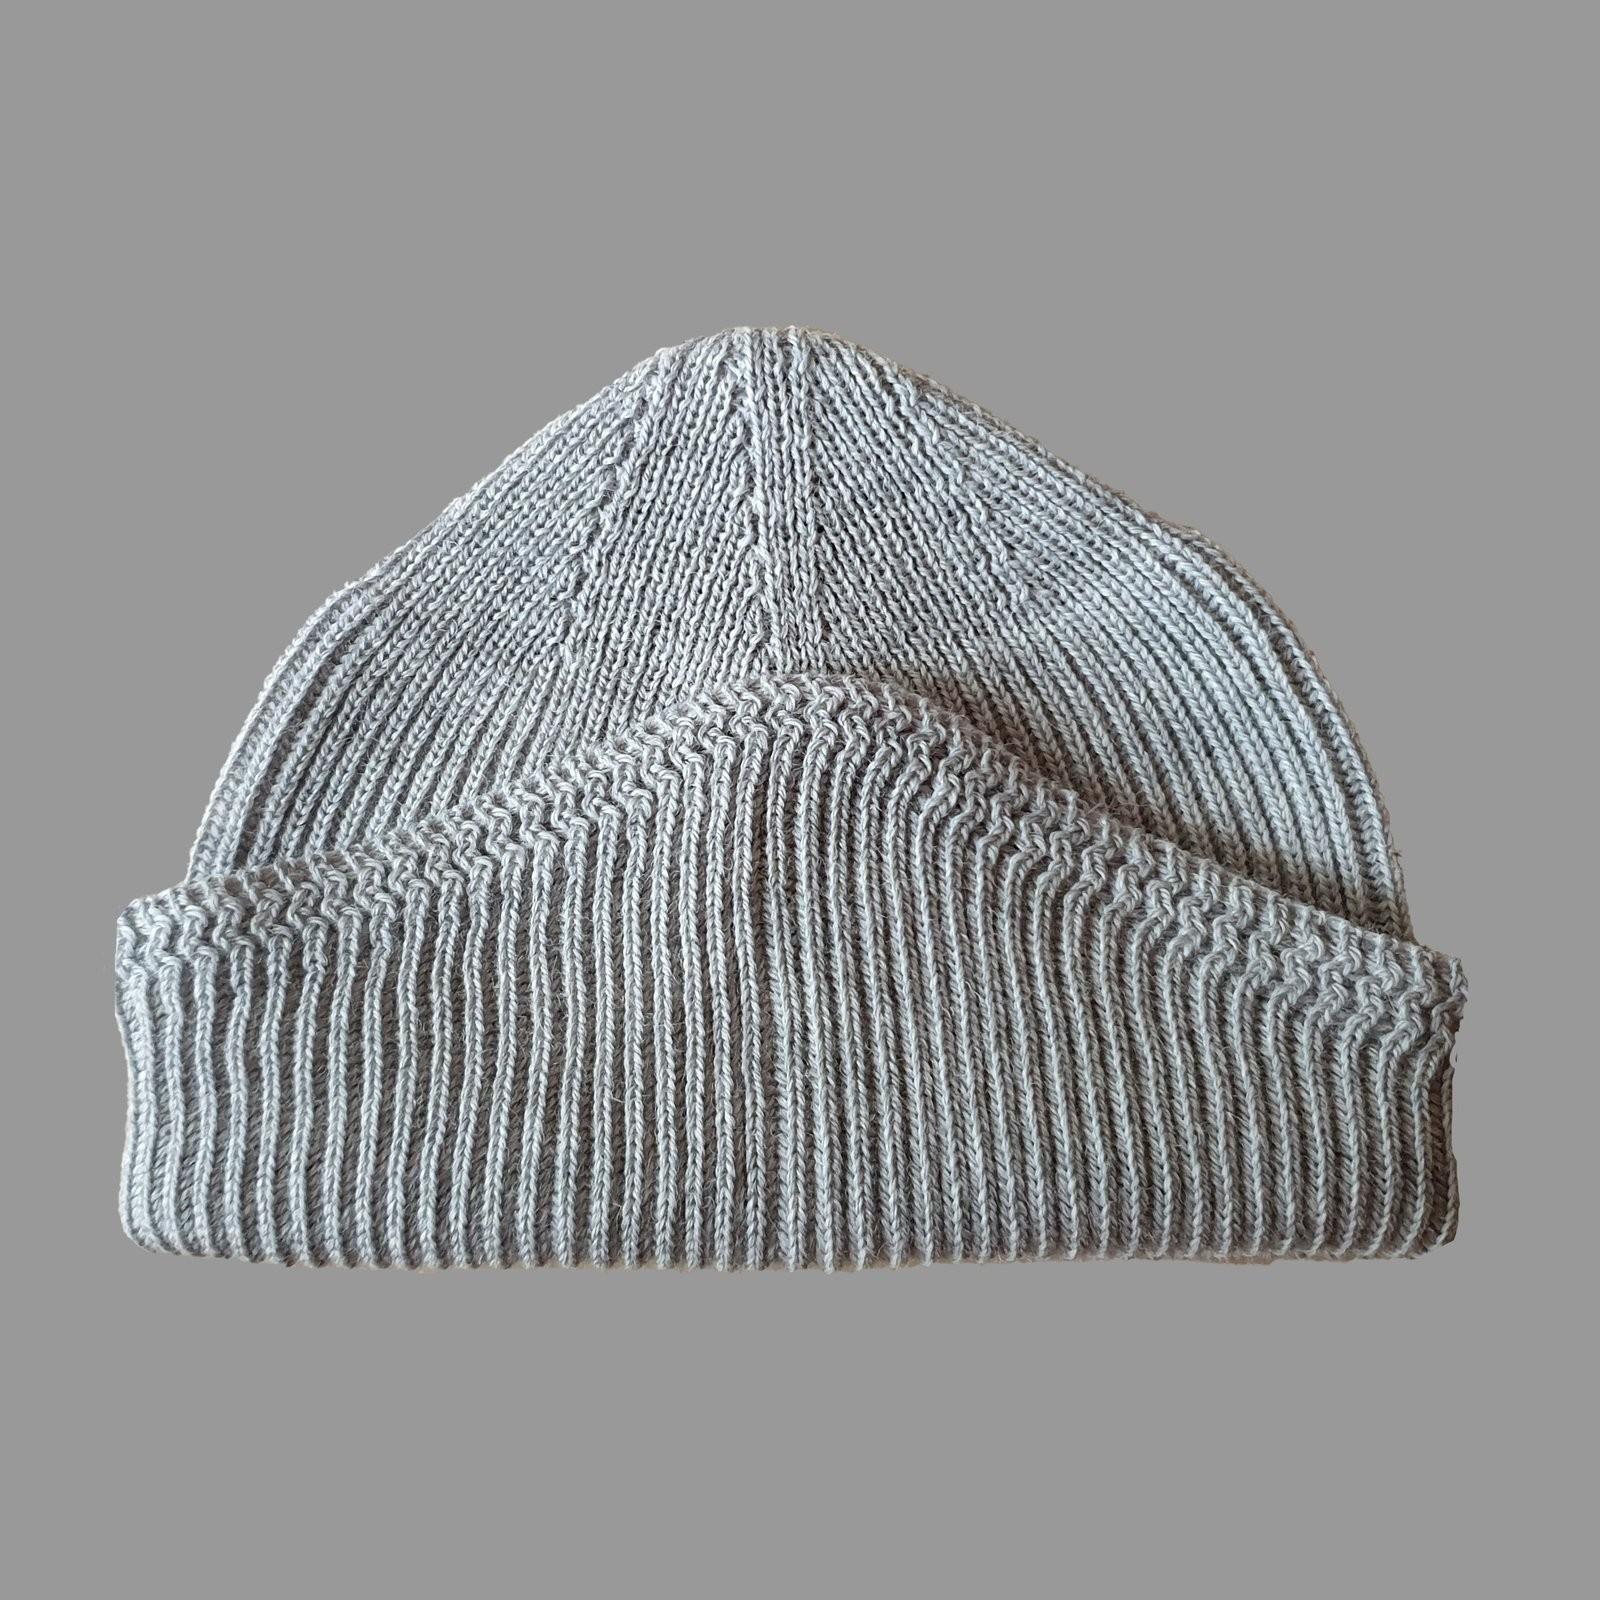 NSC DECK HAT : GREY